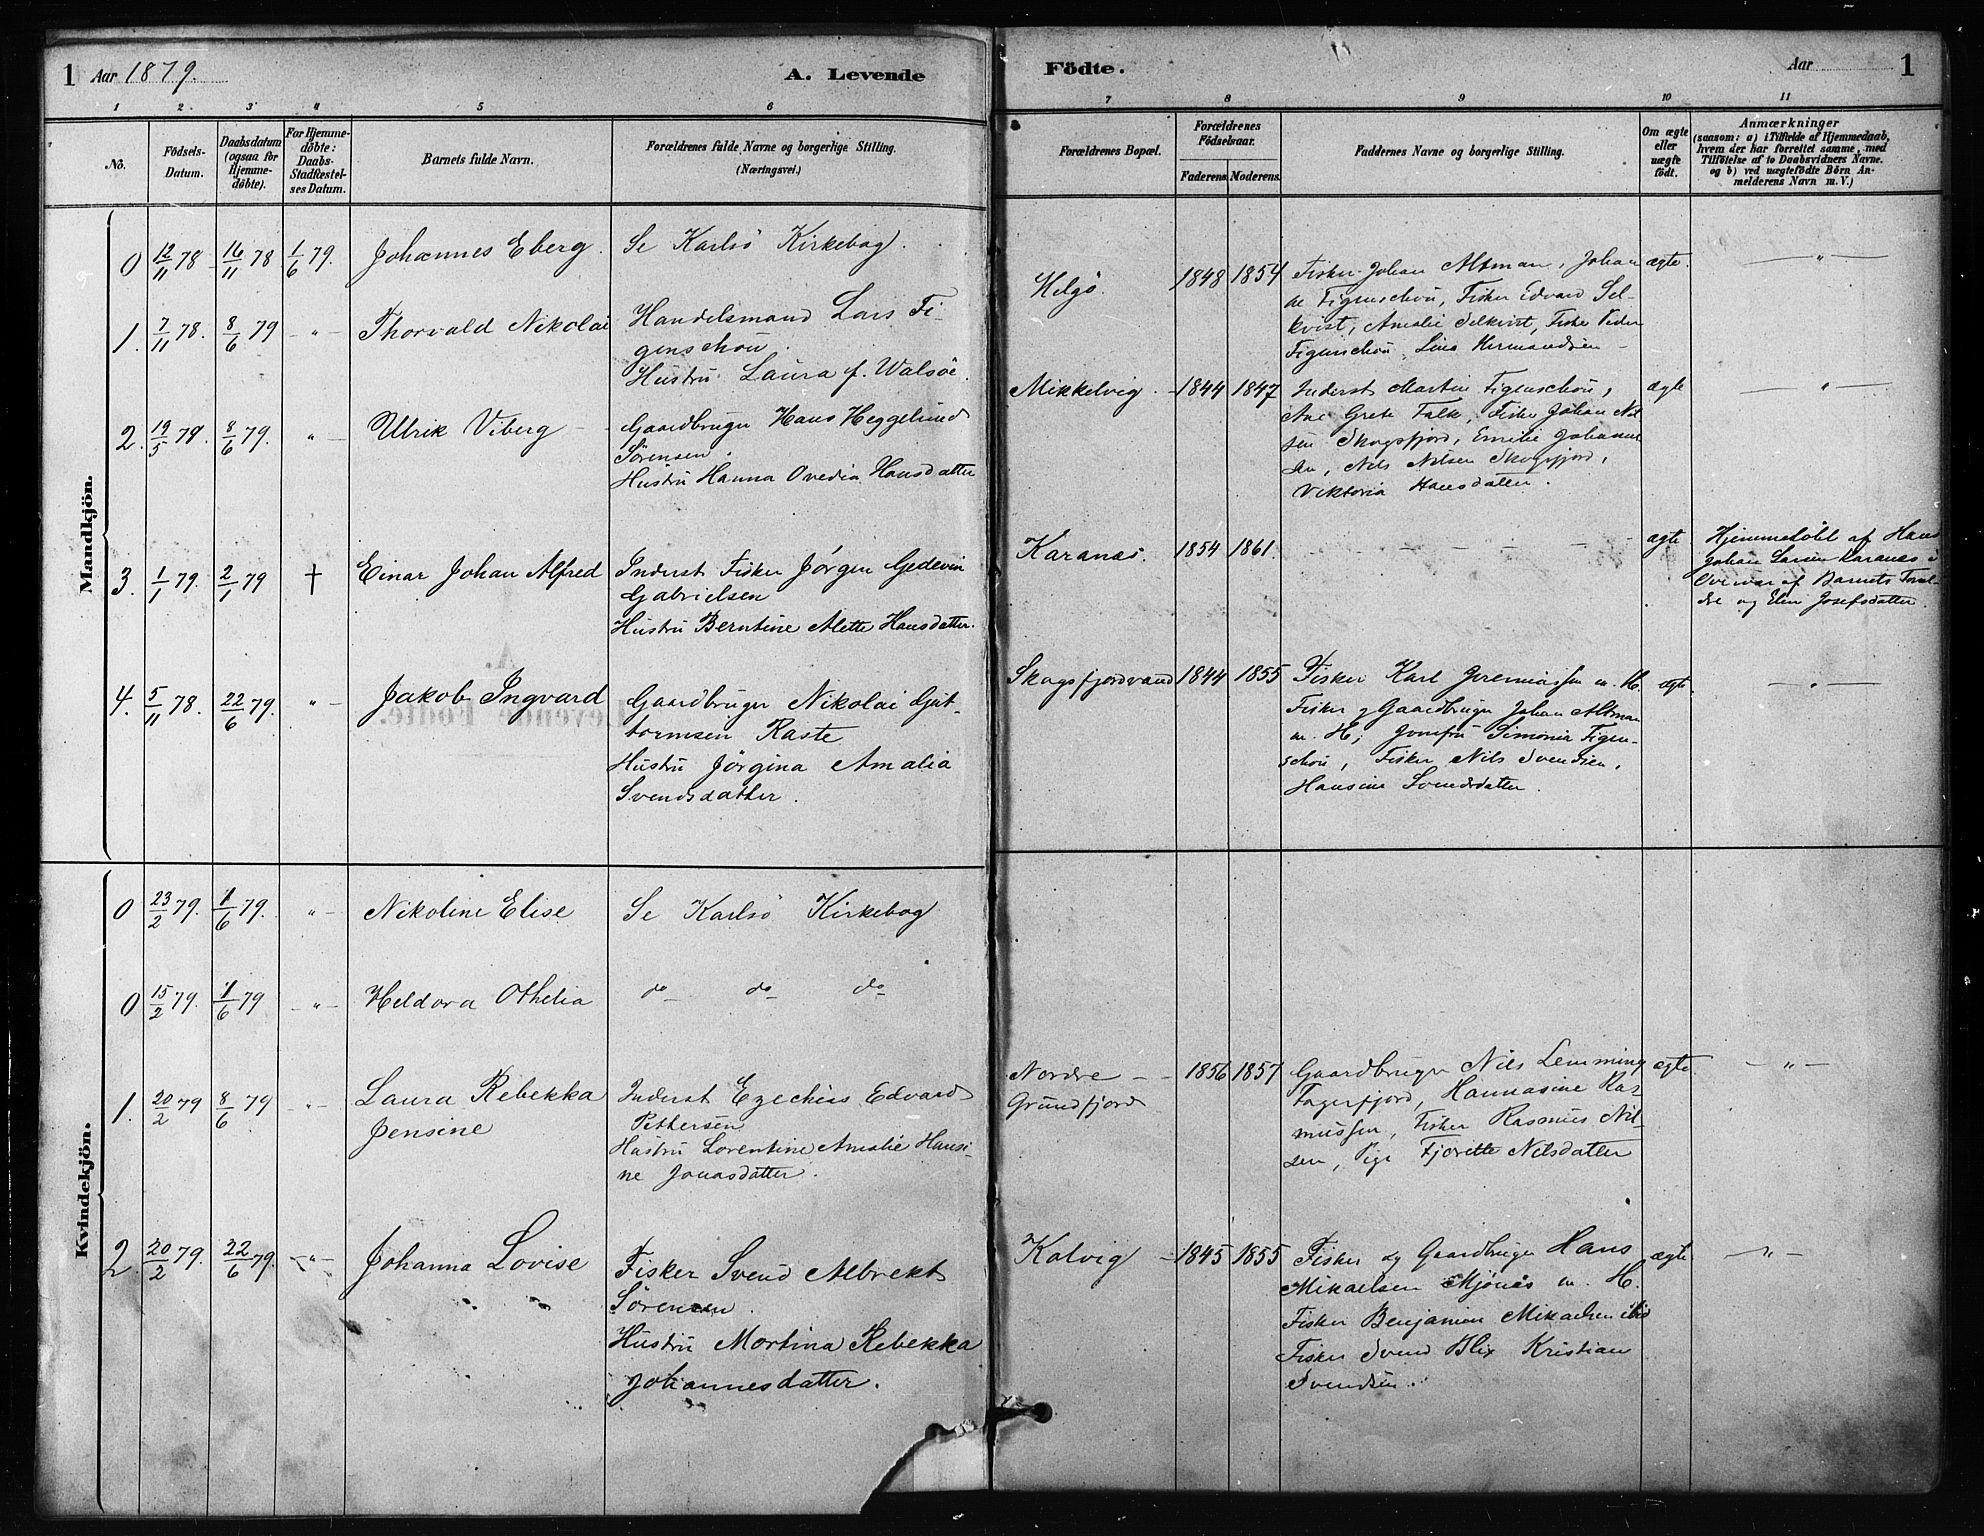 SATØ, Karlsøy sokneprestembete, H/Ha/Haa/L0011kirke: Ministerialbok nr. 11, 1879-1892, s. 1